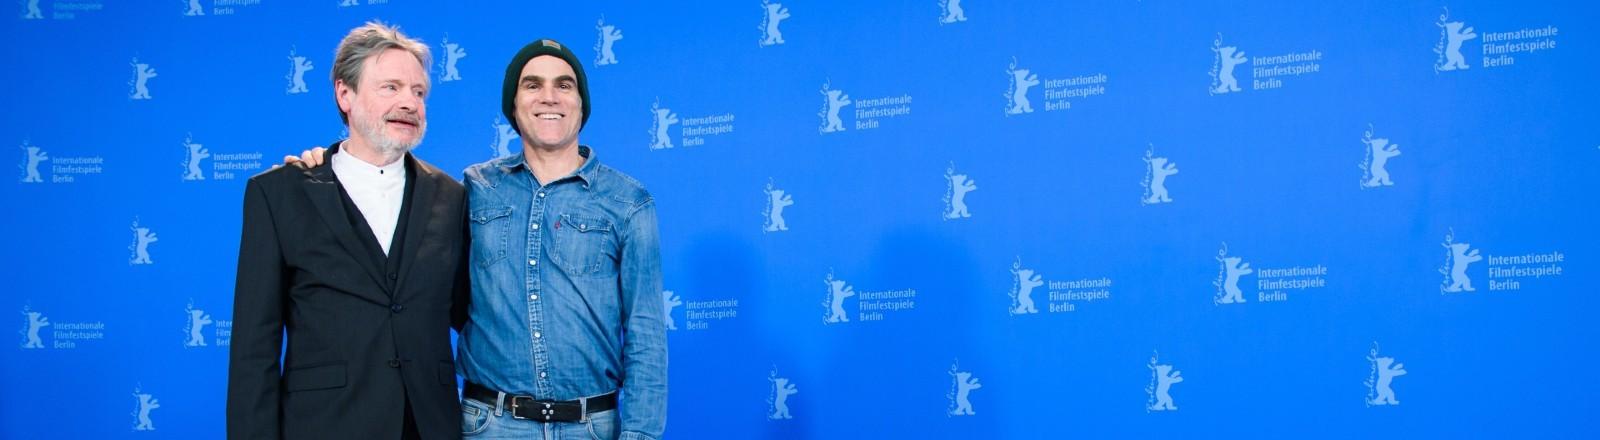 "70. Berlinale, Photocall, Berlinale Special Gala, ""Curveball"": Schauspieler Michael Wittenborn (l) und Sebastian Blomberg."